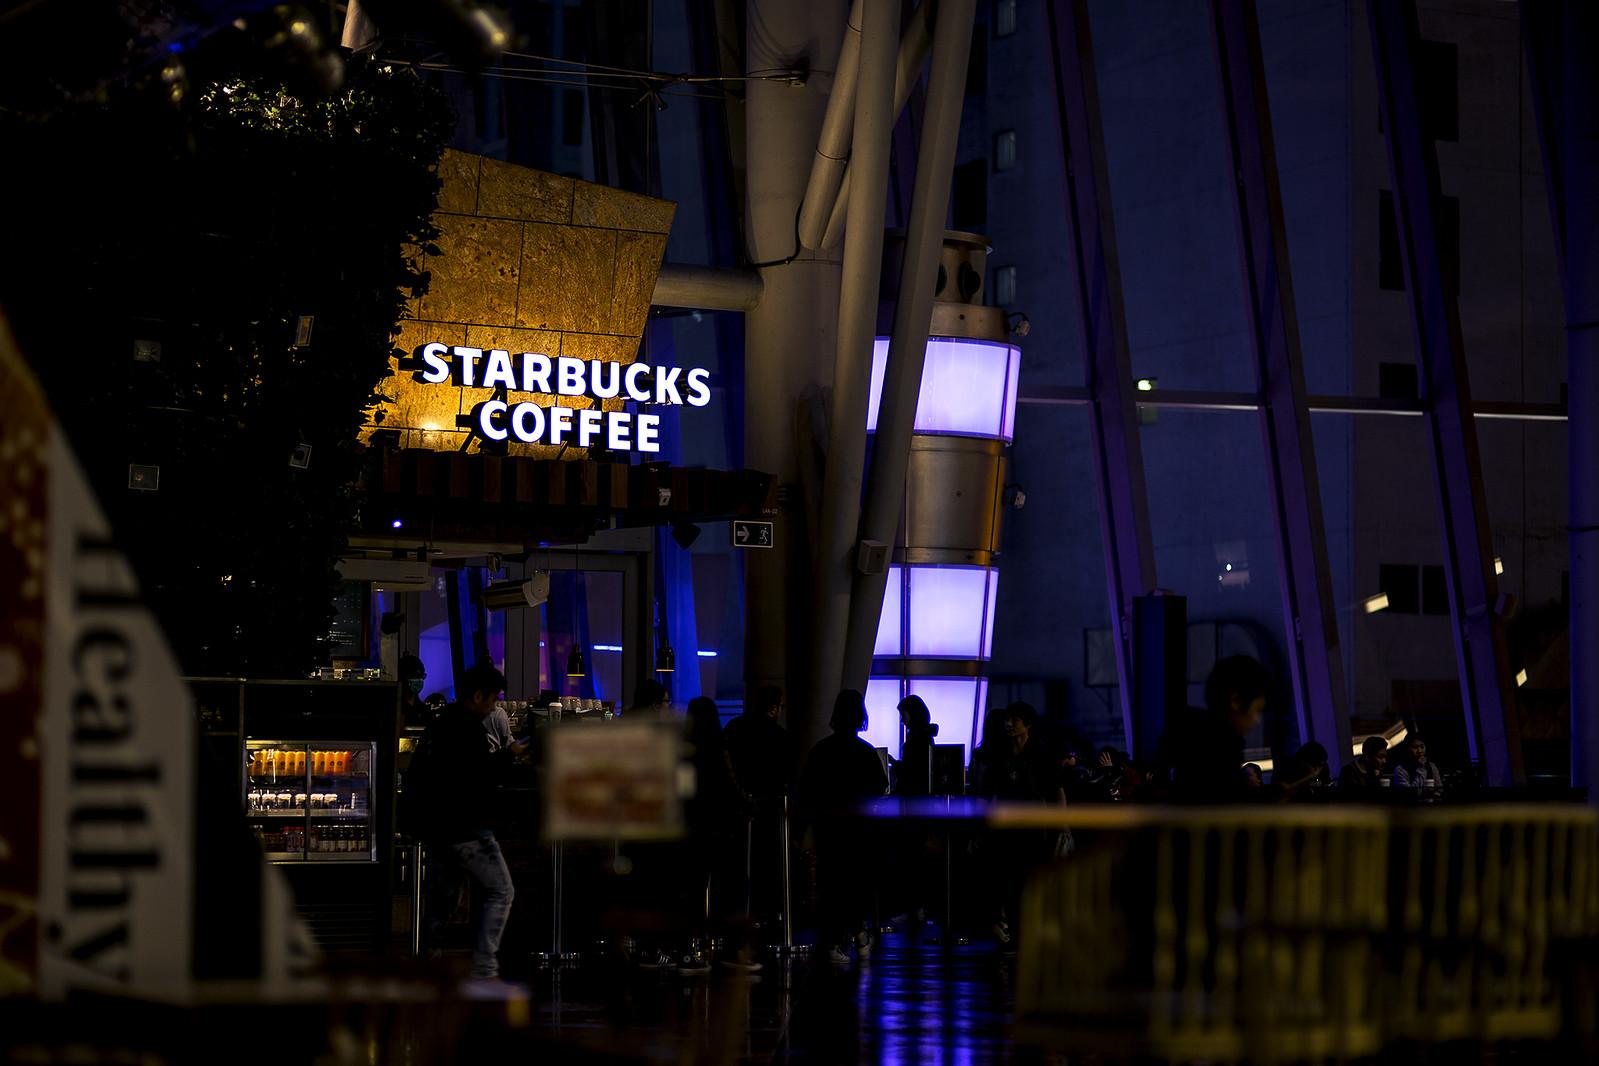 Starbucks Langham Place